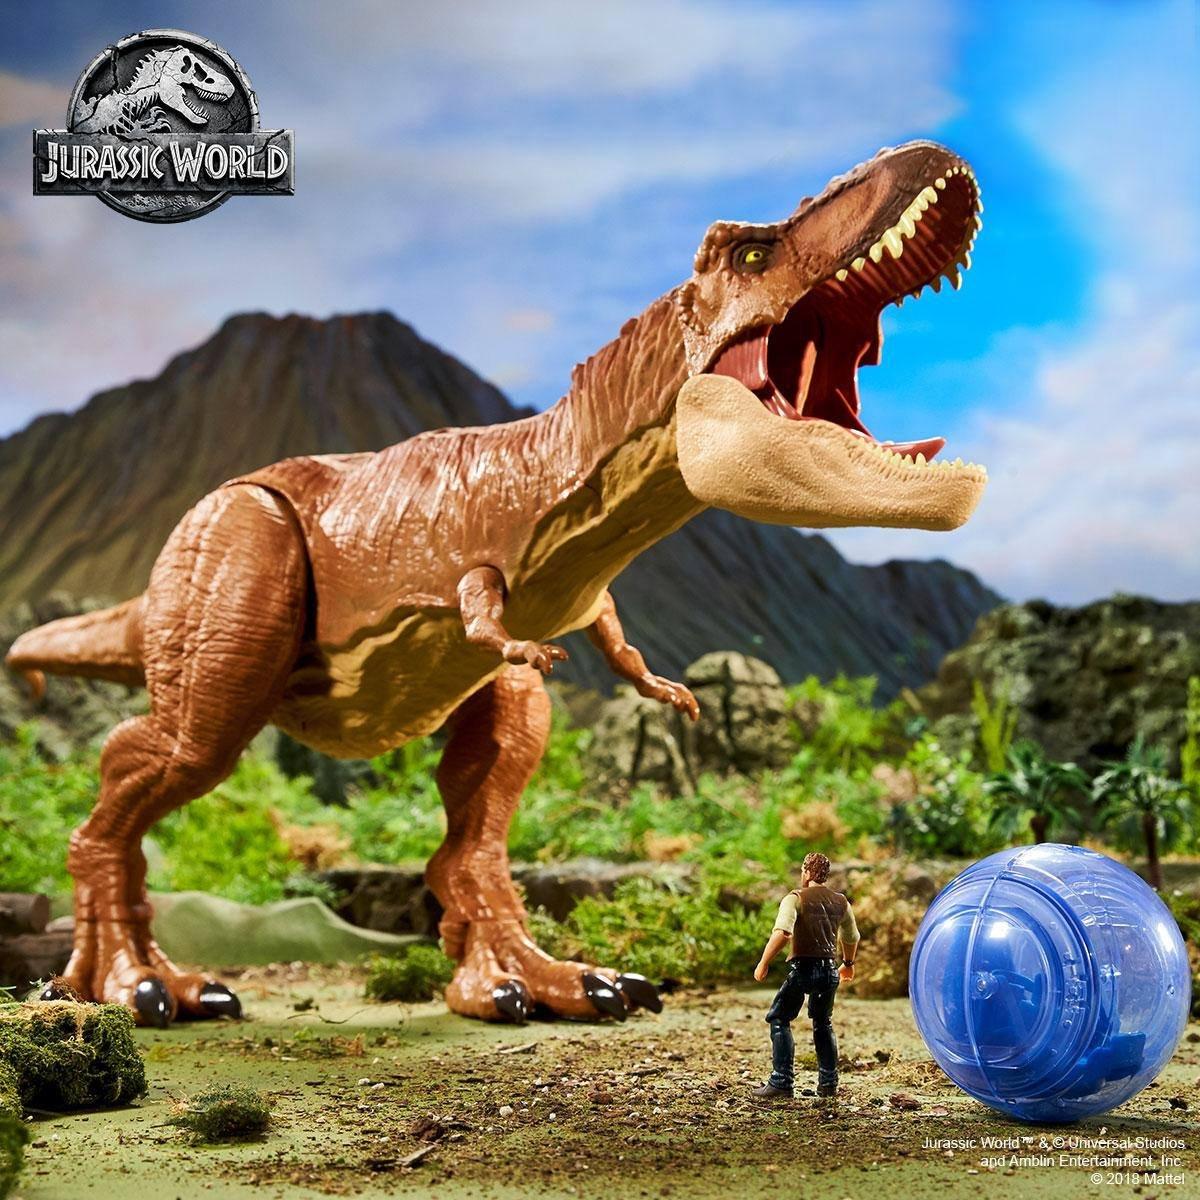 Jurassic World FMY70 Thrash/'n Throw Tyrannosaurus Rex Figure